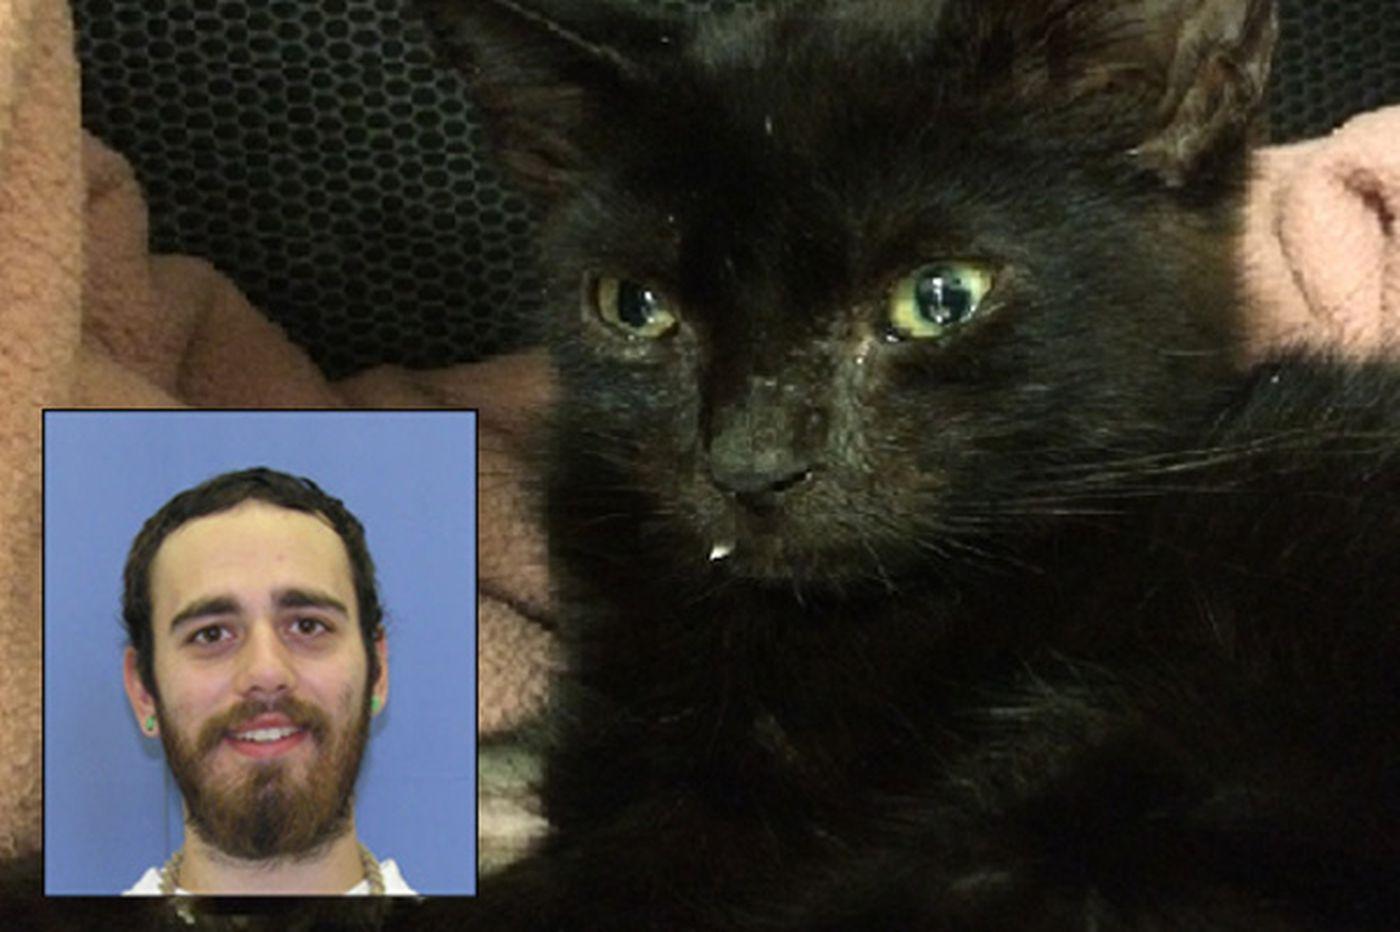 Heroin kitty bounces back; attacker awaits fate